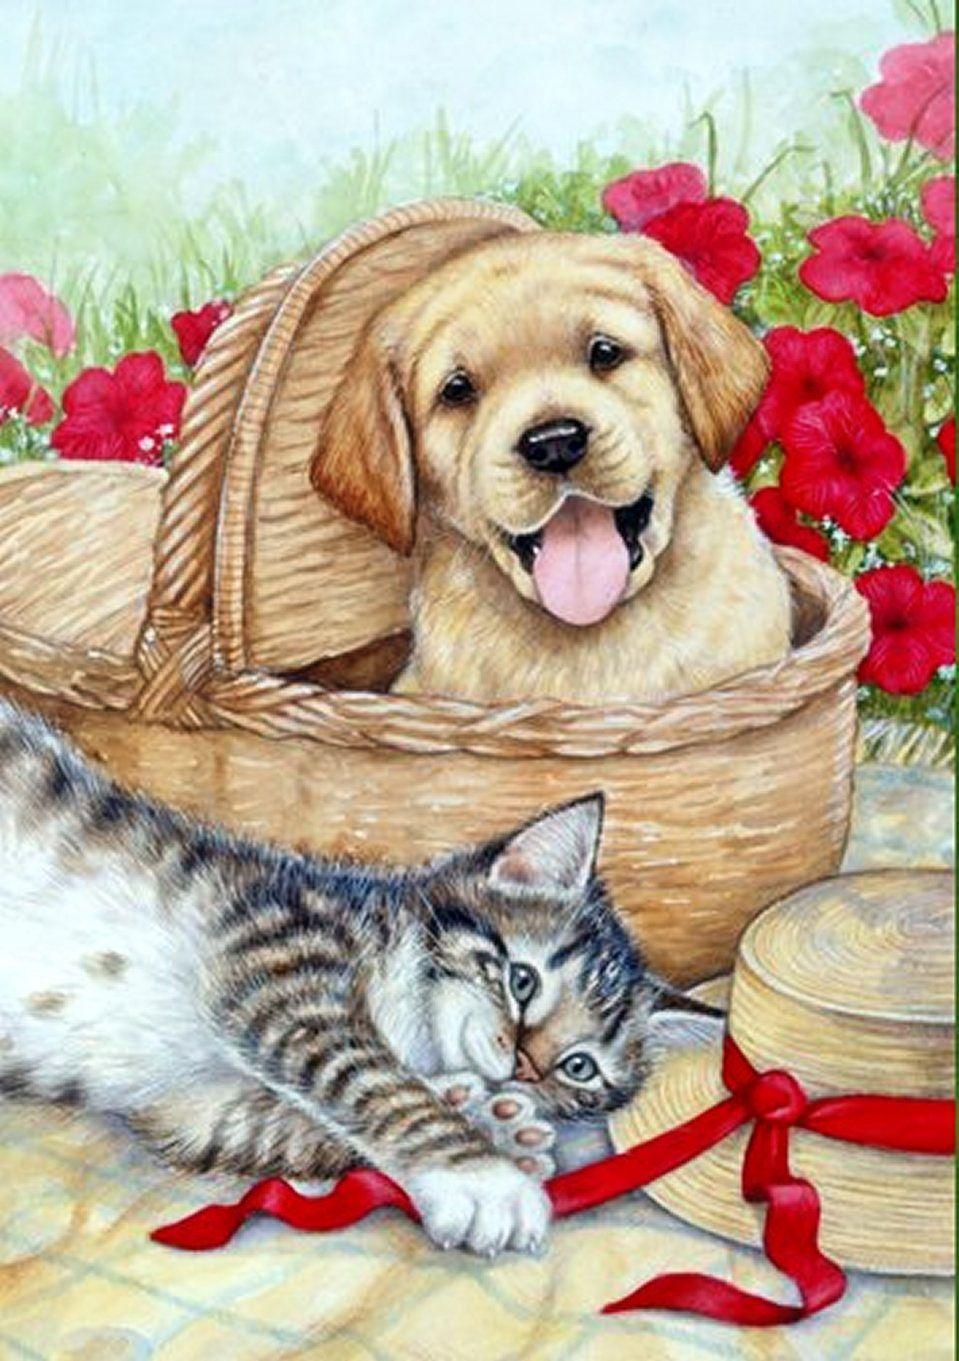 Katzen Und Hundebild Dieren Kleurplaten Hond Tekeningen Dieren Tekenen